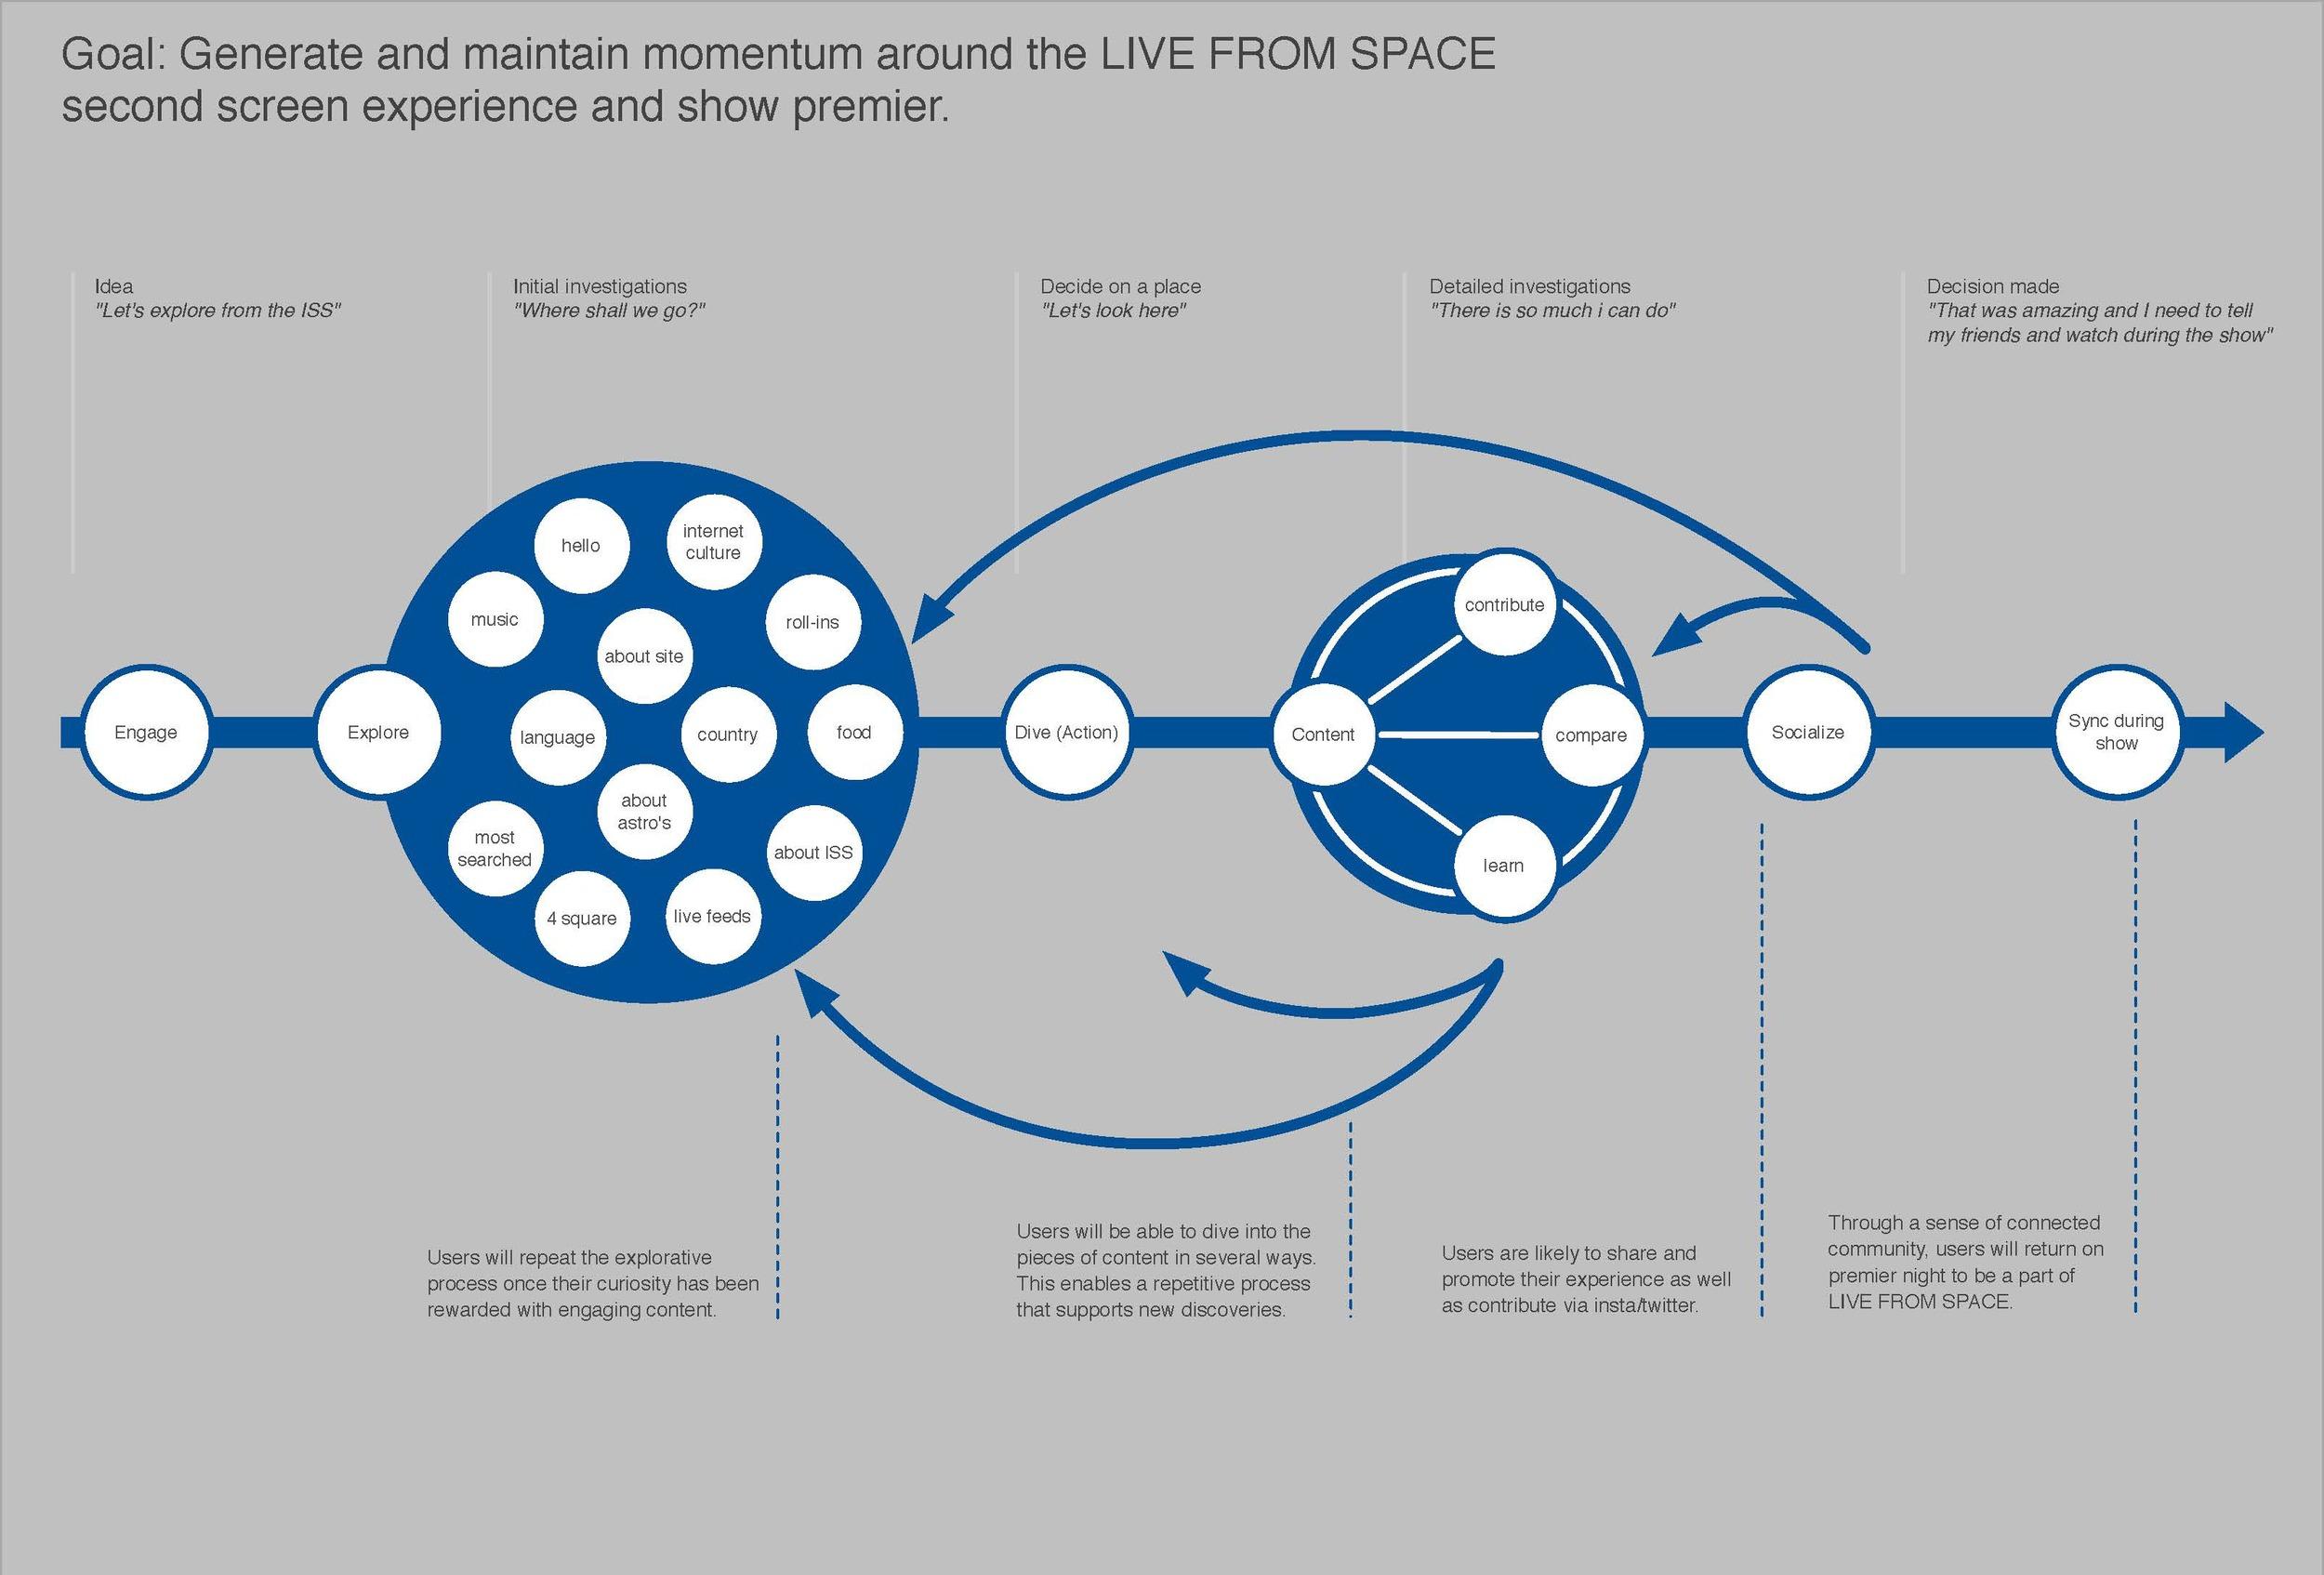 SPACE_task_model_v1.0.jpg